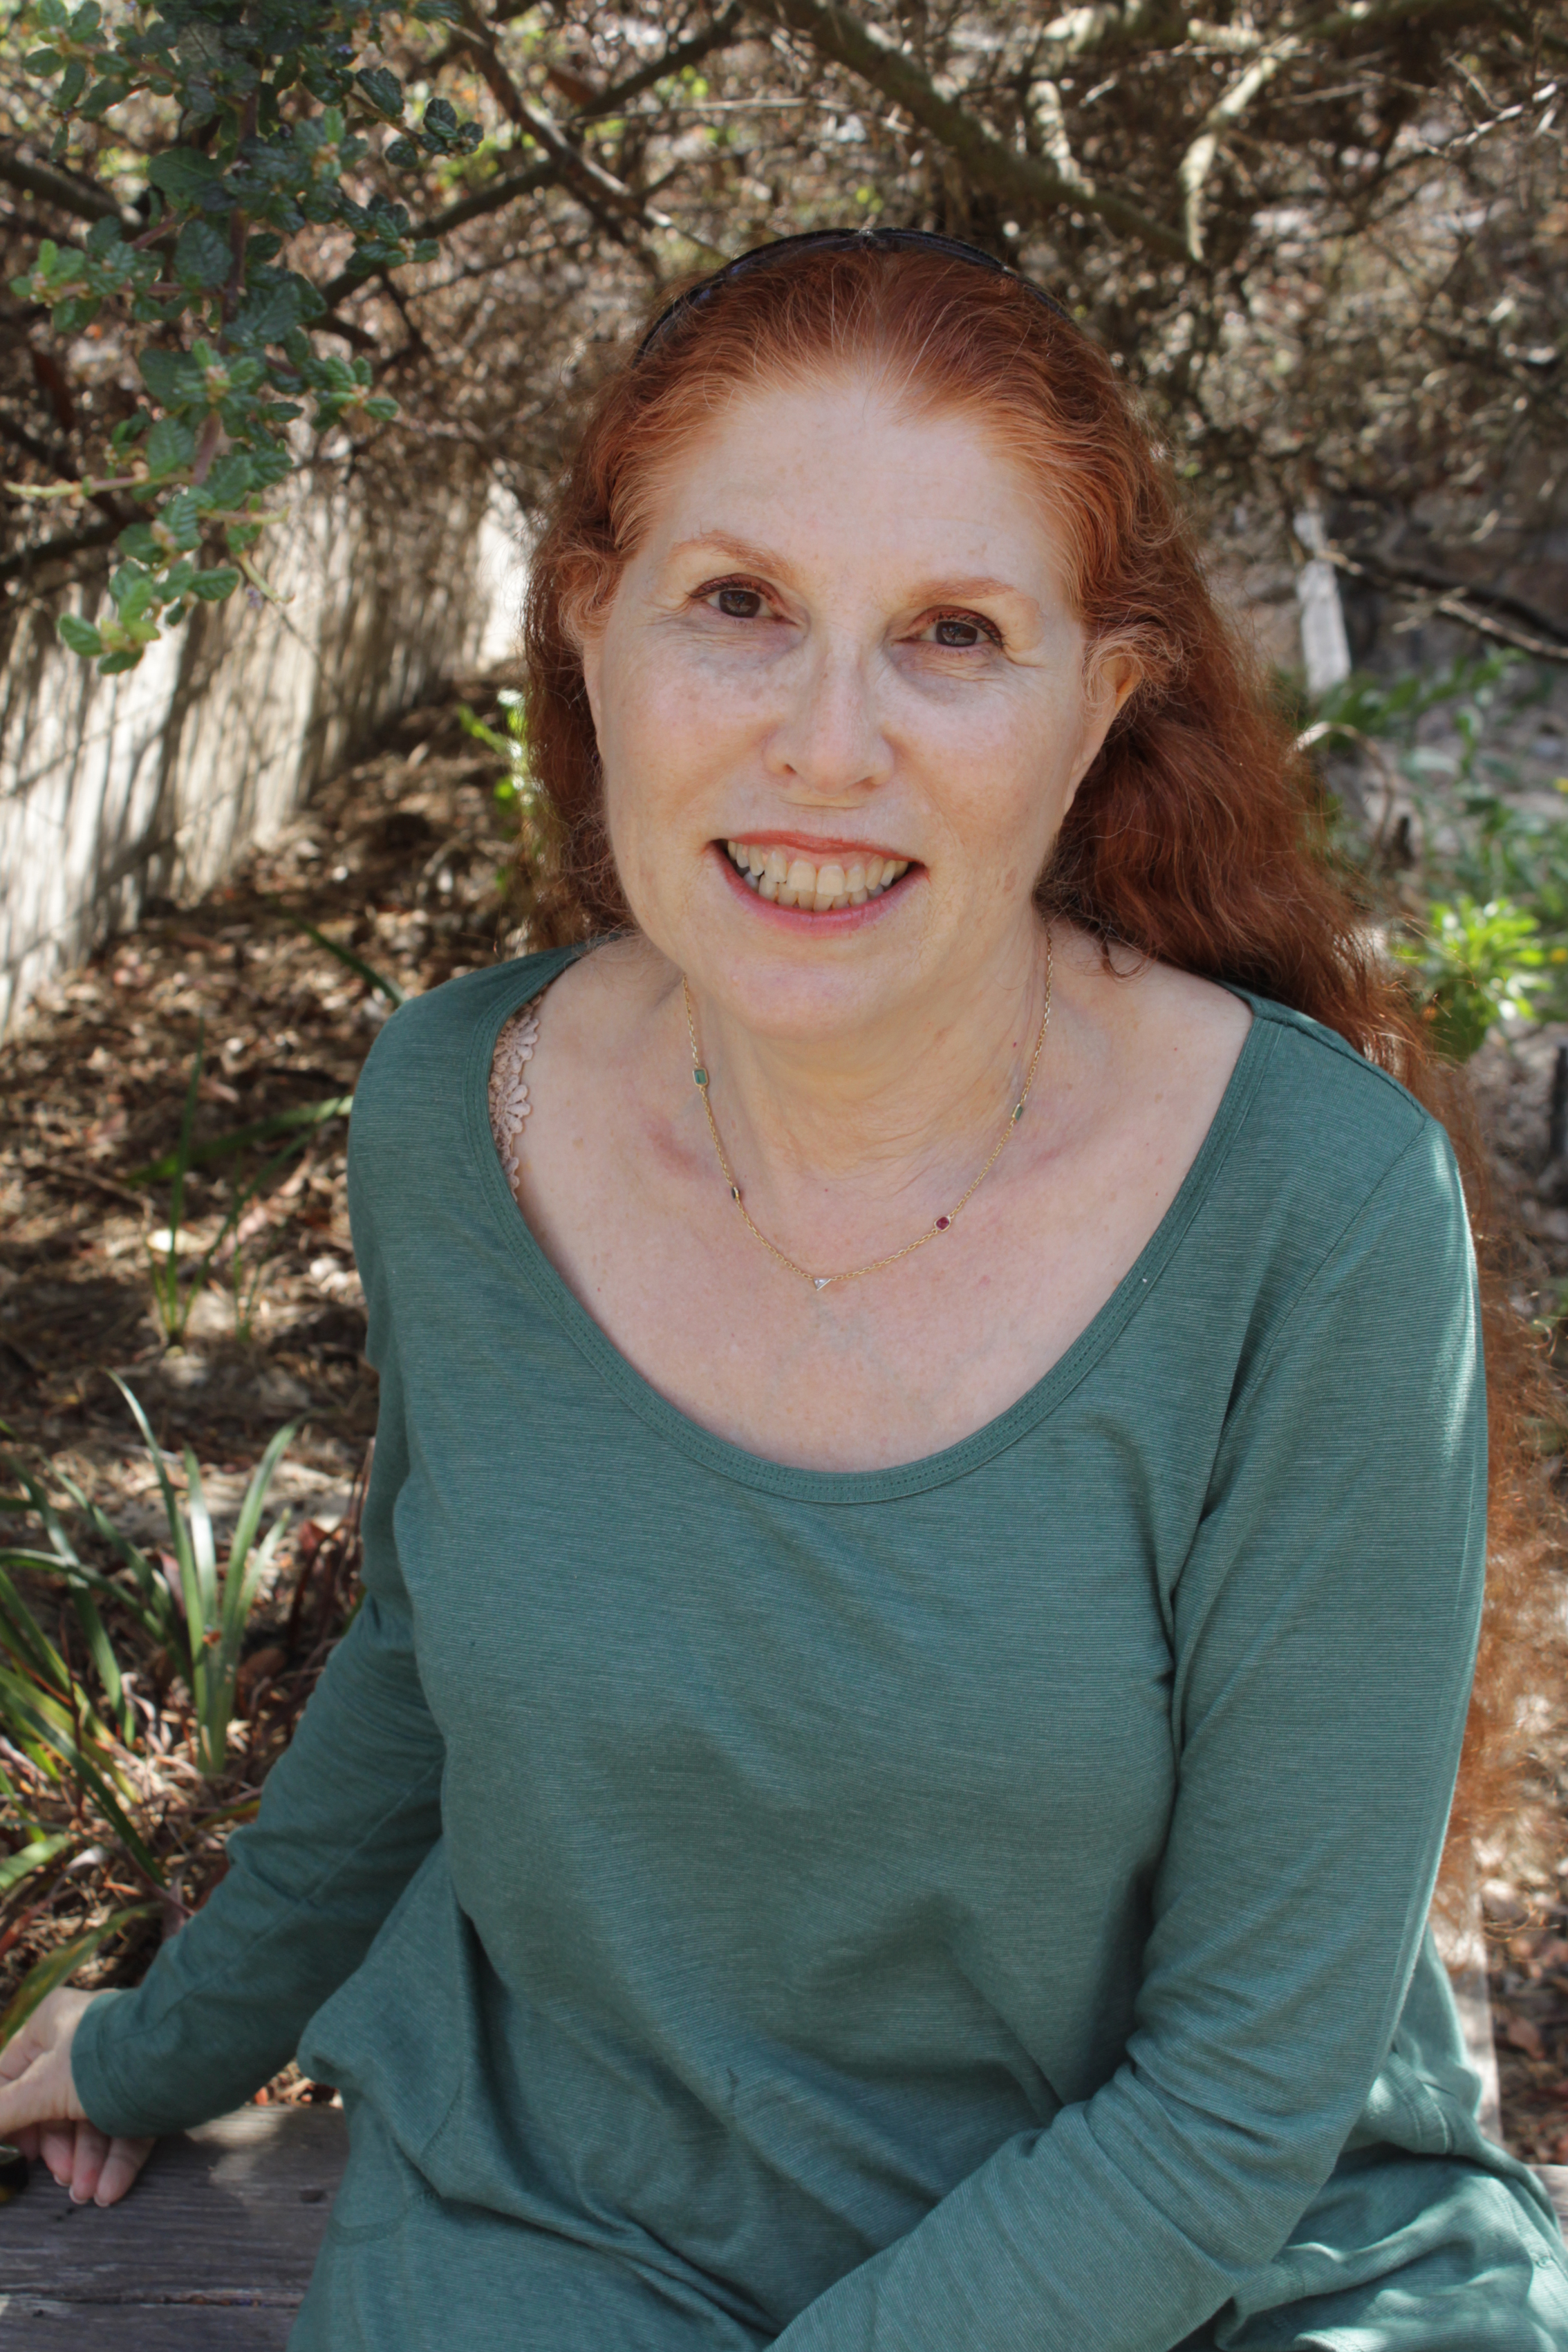 Elinor at the AAGT Conference, Asilomar, California, September 2014. Image courtesy of the British Gestalt Journal.